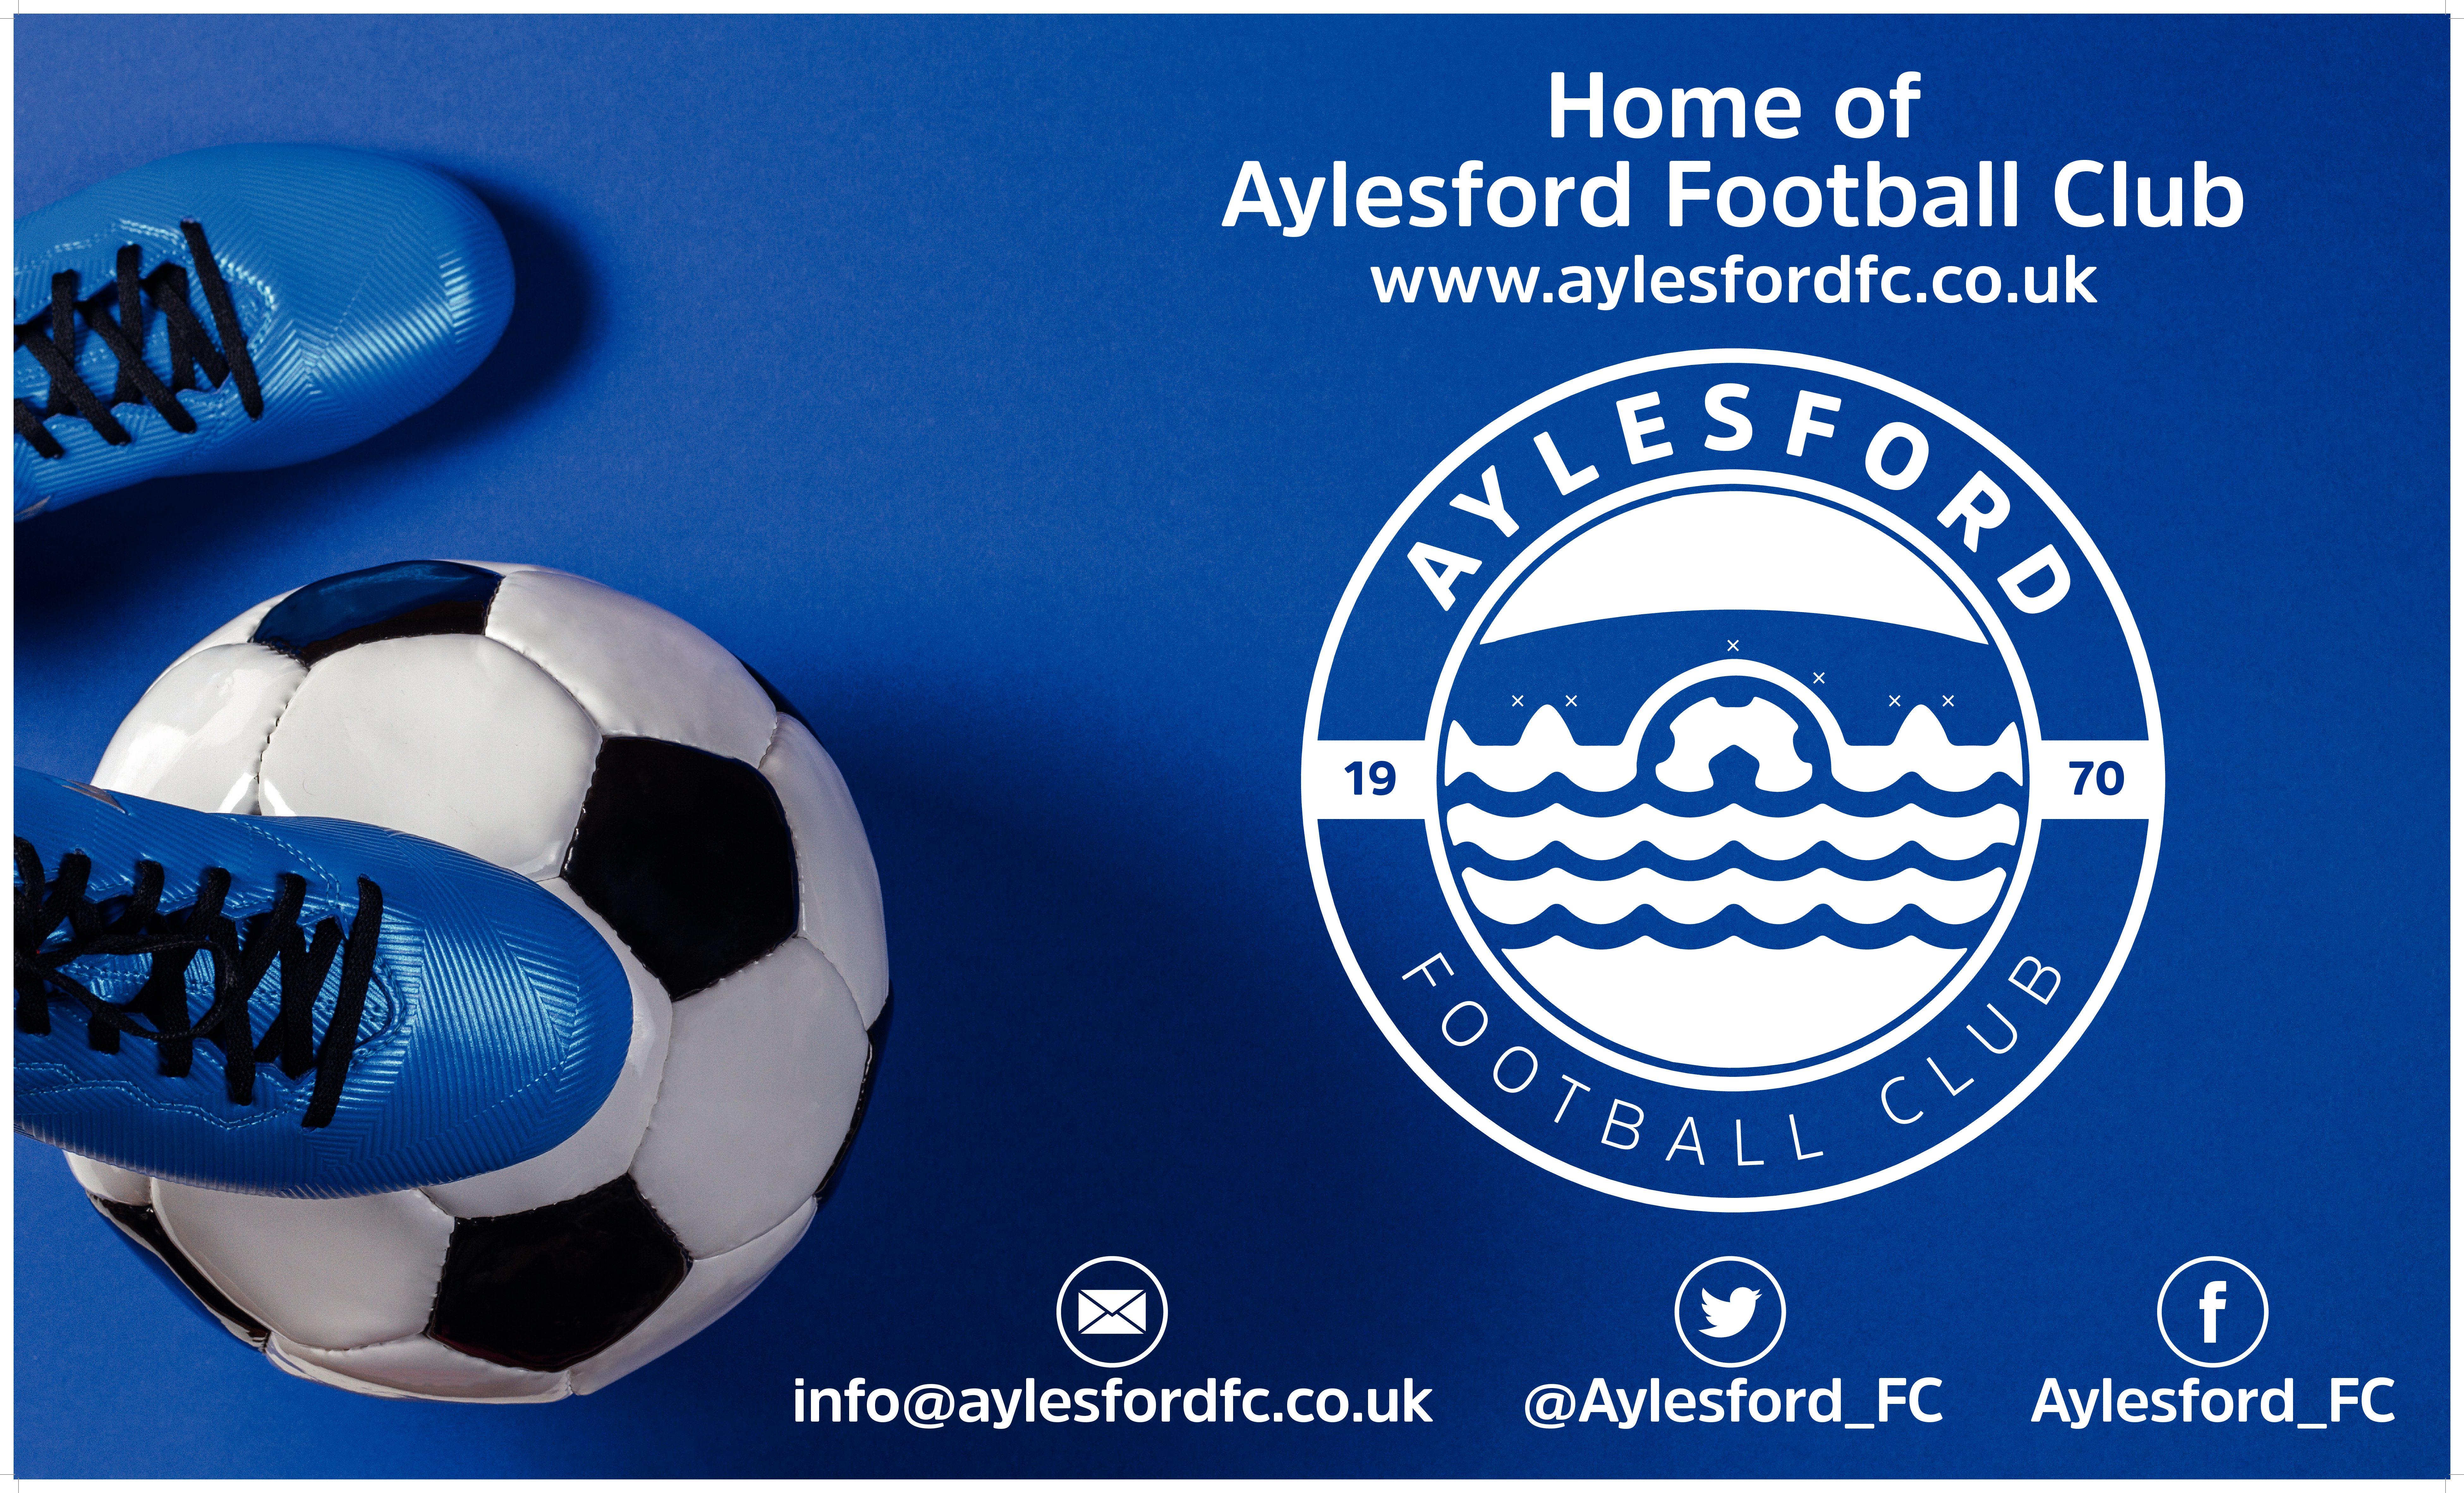 http://aylesfordfc.co.uk/wp-content/uploads/Aylesford-FC-Banner-5x3-ft-print-pdf.jpg